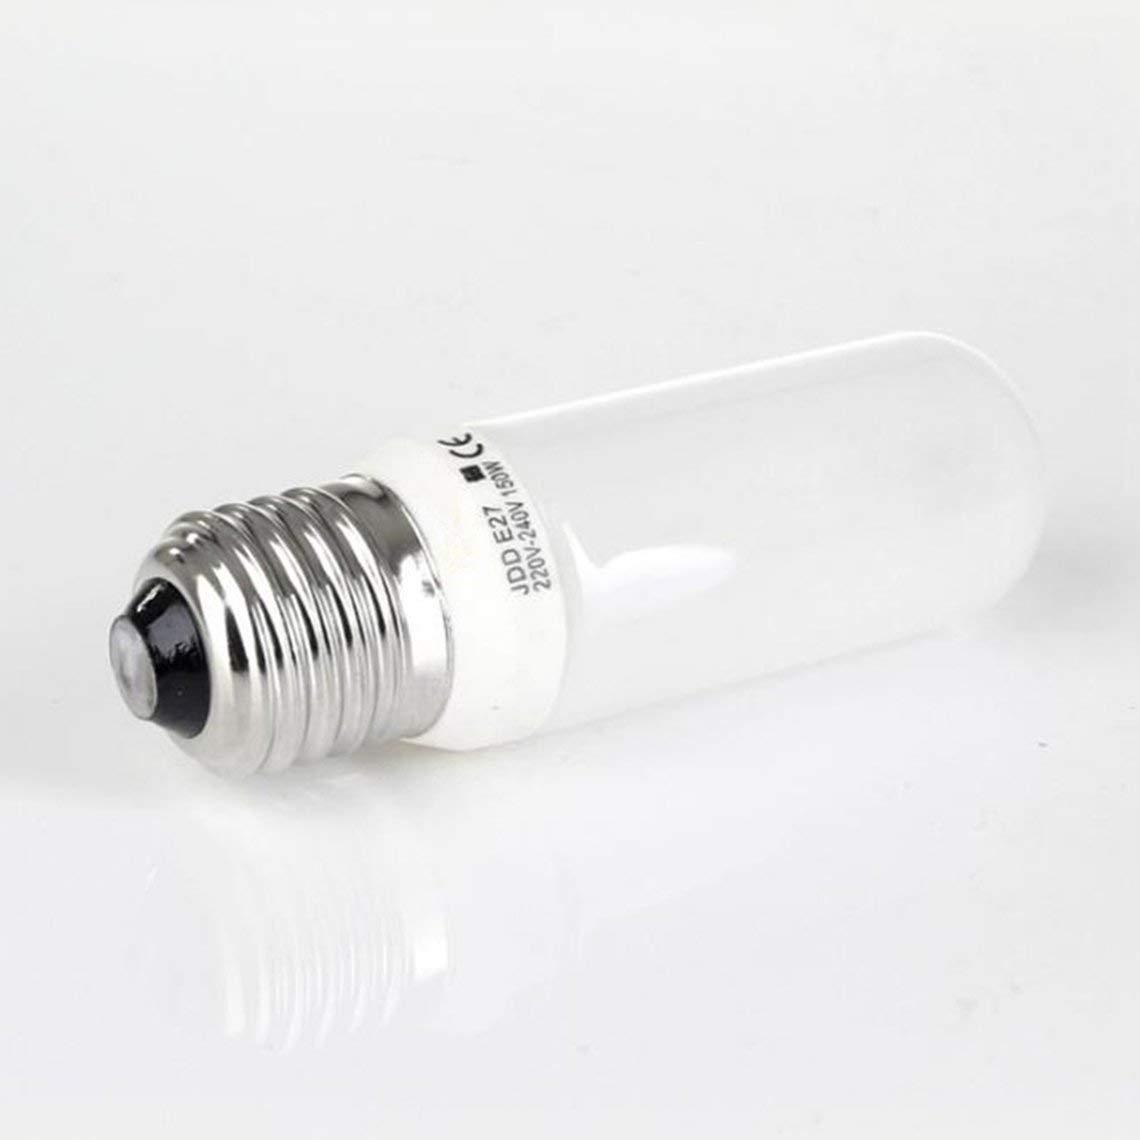 Zinniaya Flash Universal 250w 150w Tornillo de fotograf/ía E27 Bombilla de Modelado Jdd Professional Studio Light